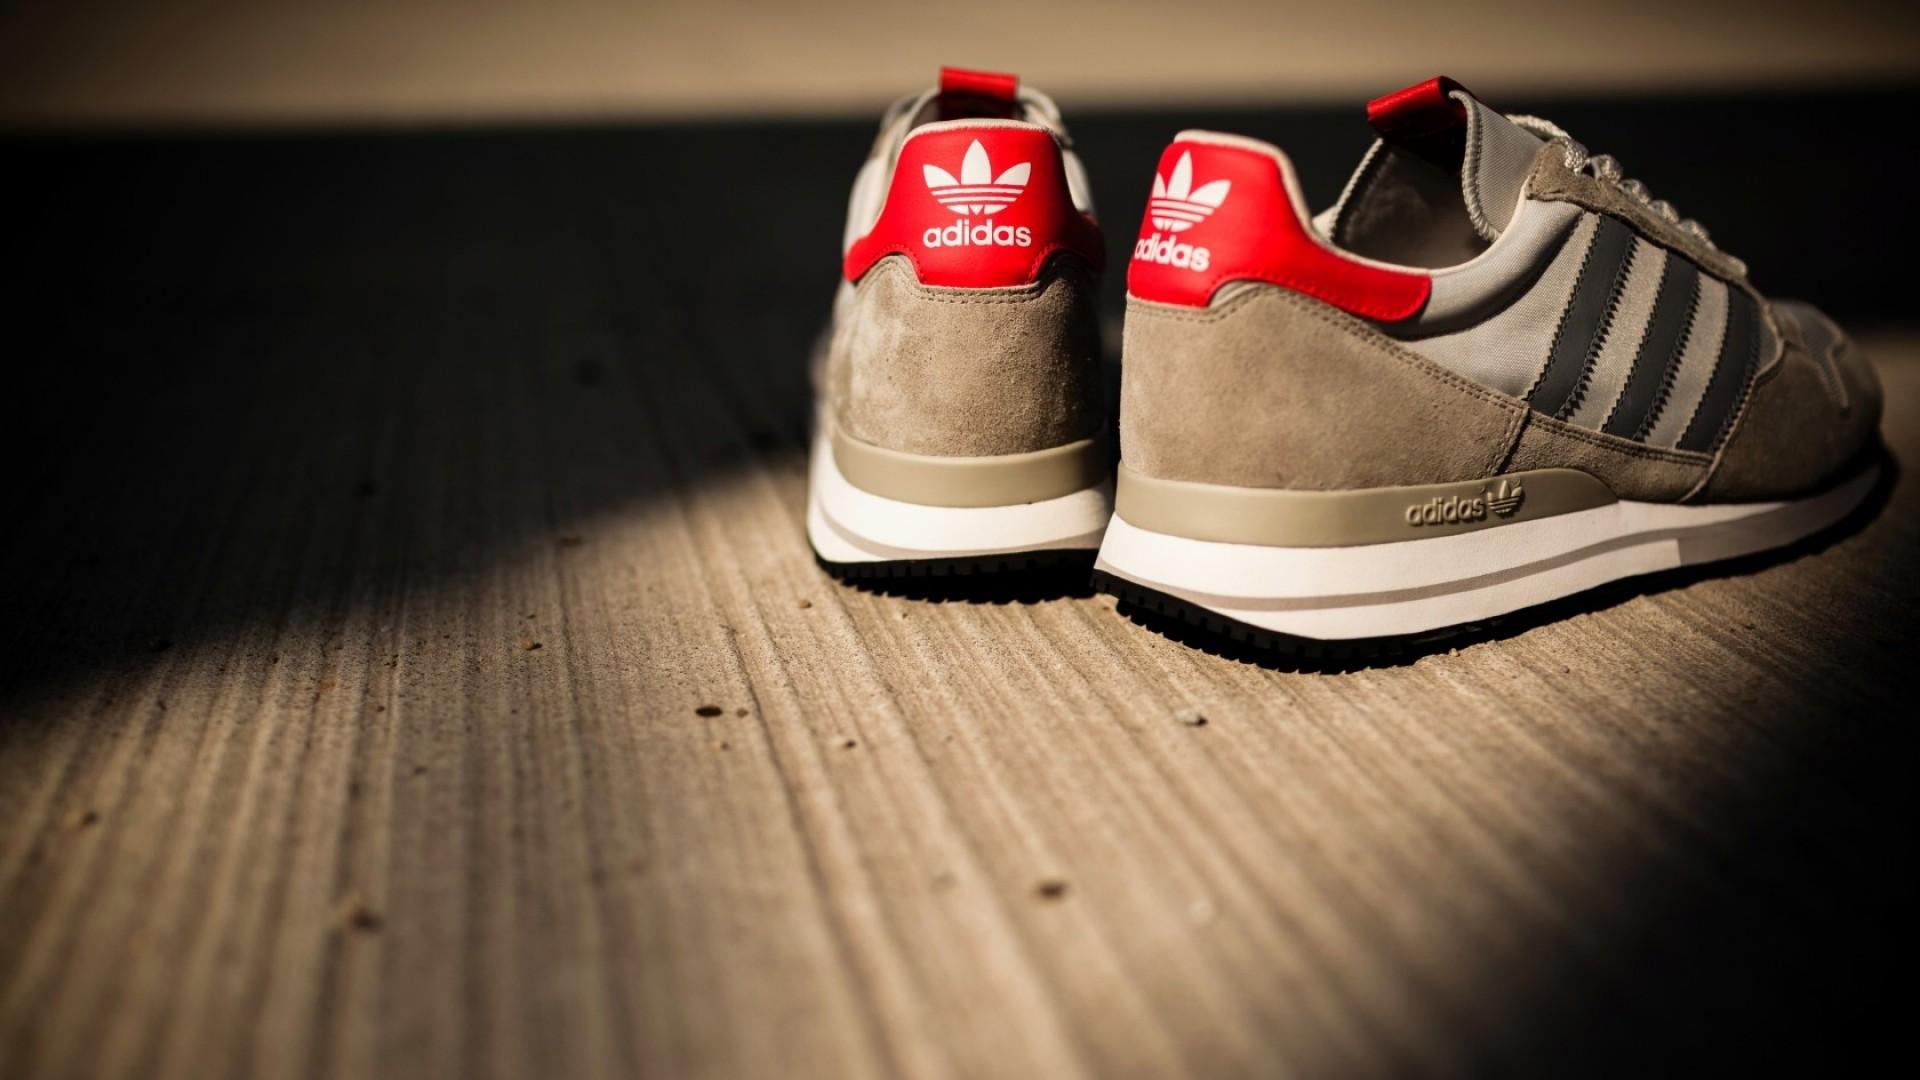 Res: 1920x1080, adidas, originals, shoes